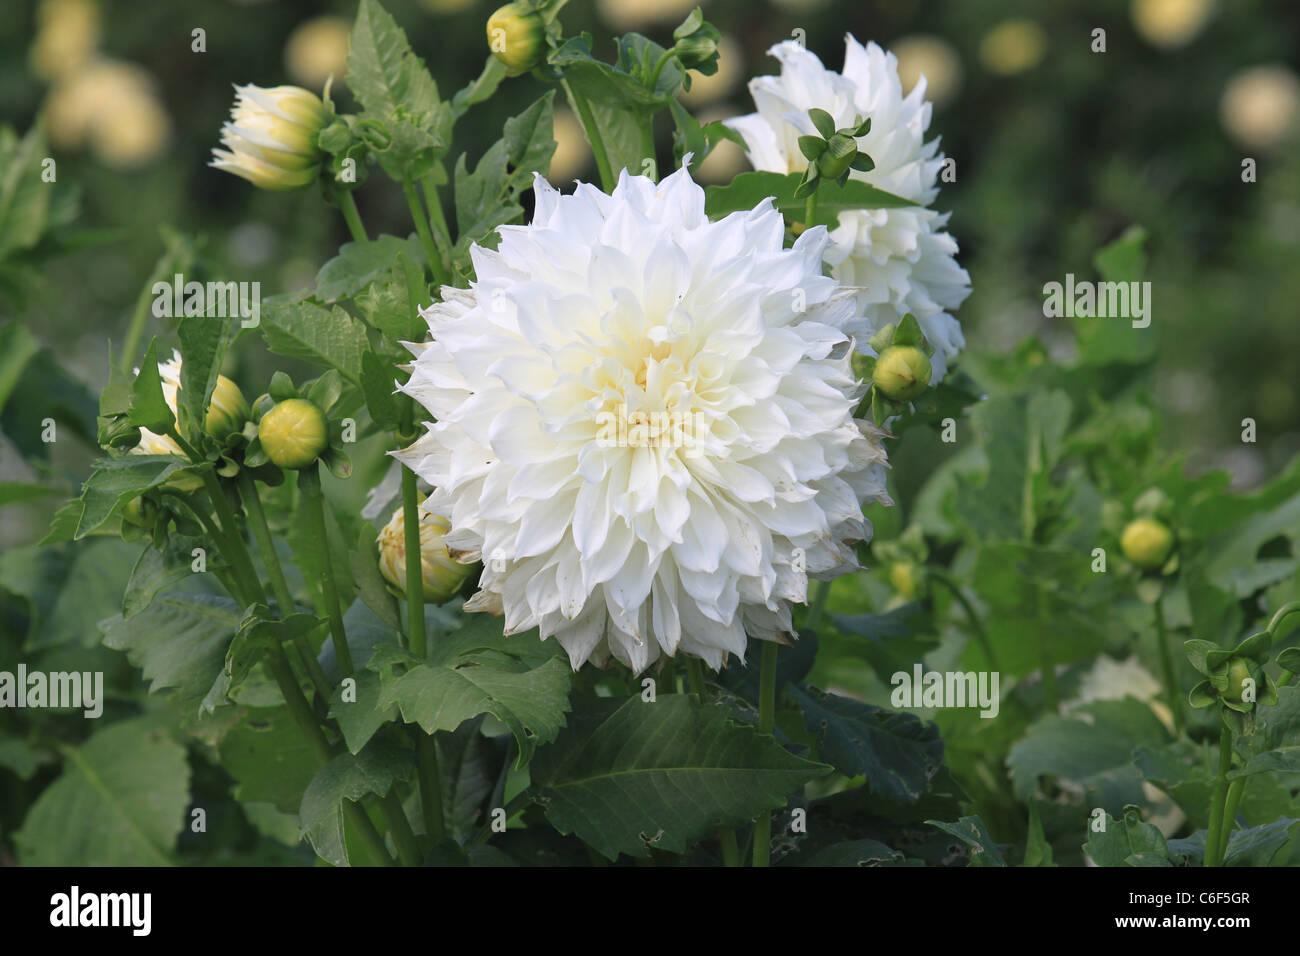 White Dahlia in the Mohonk Resort garden Stock Photo